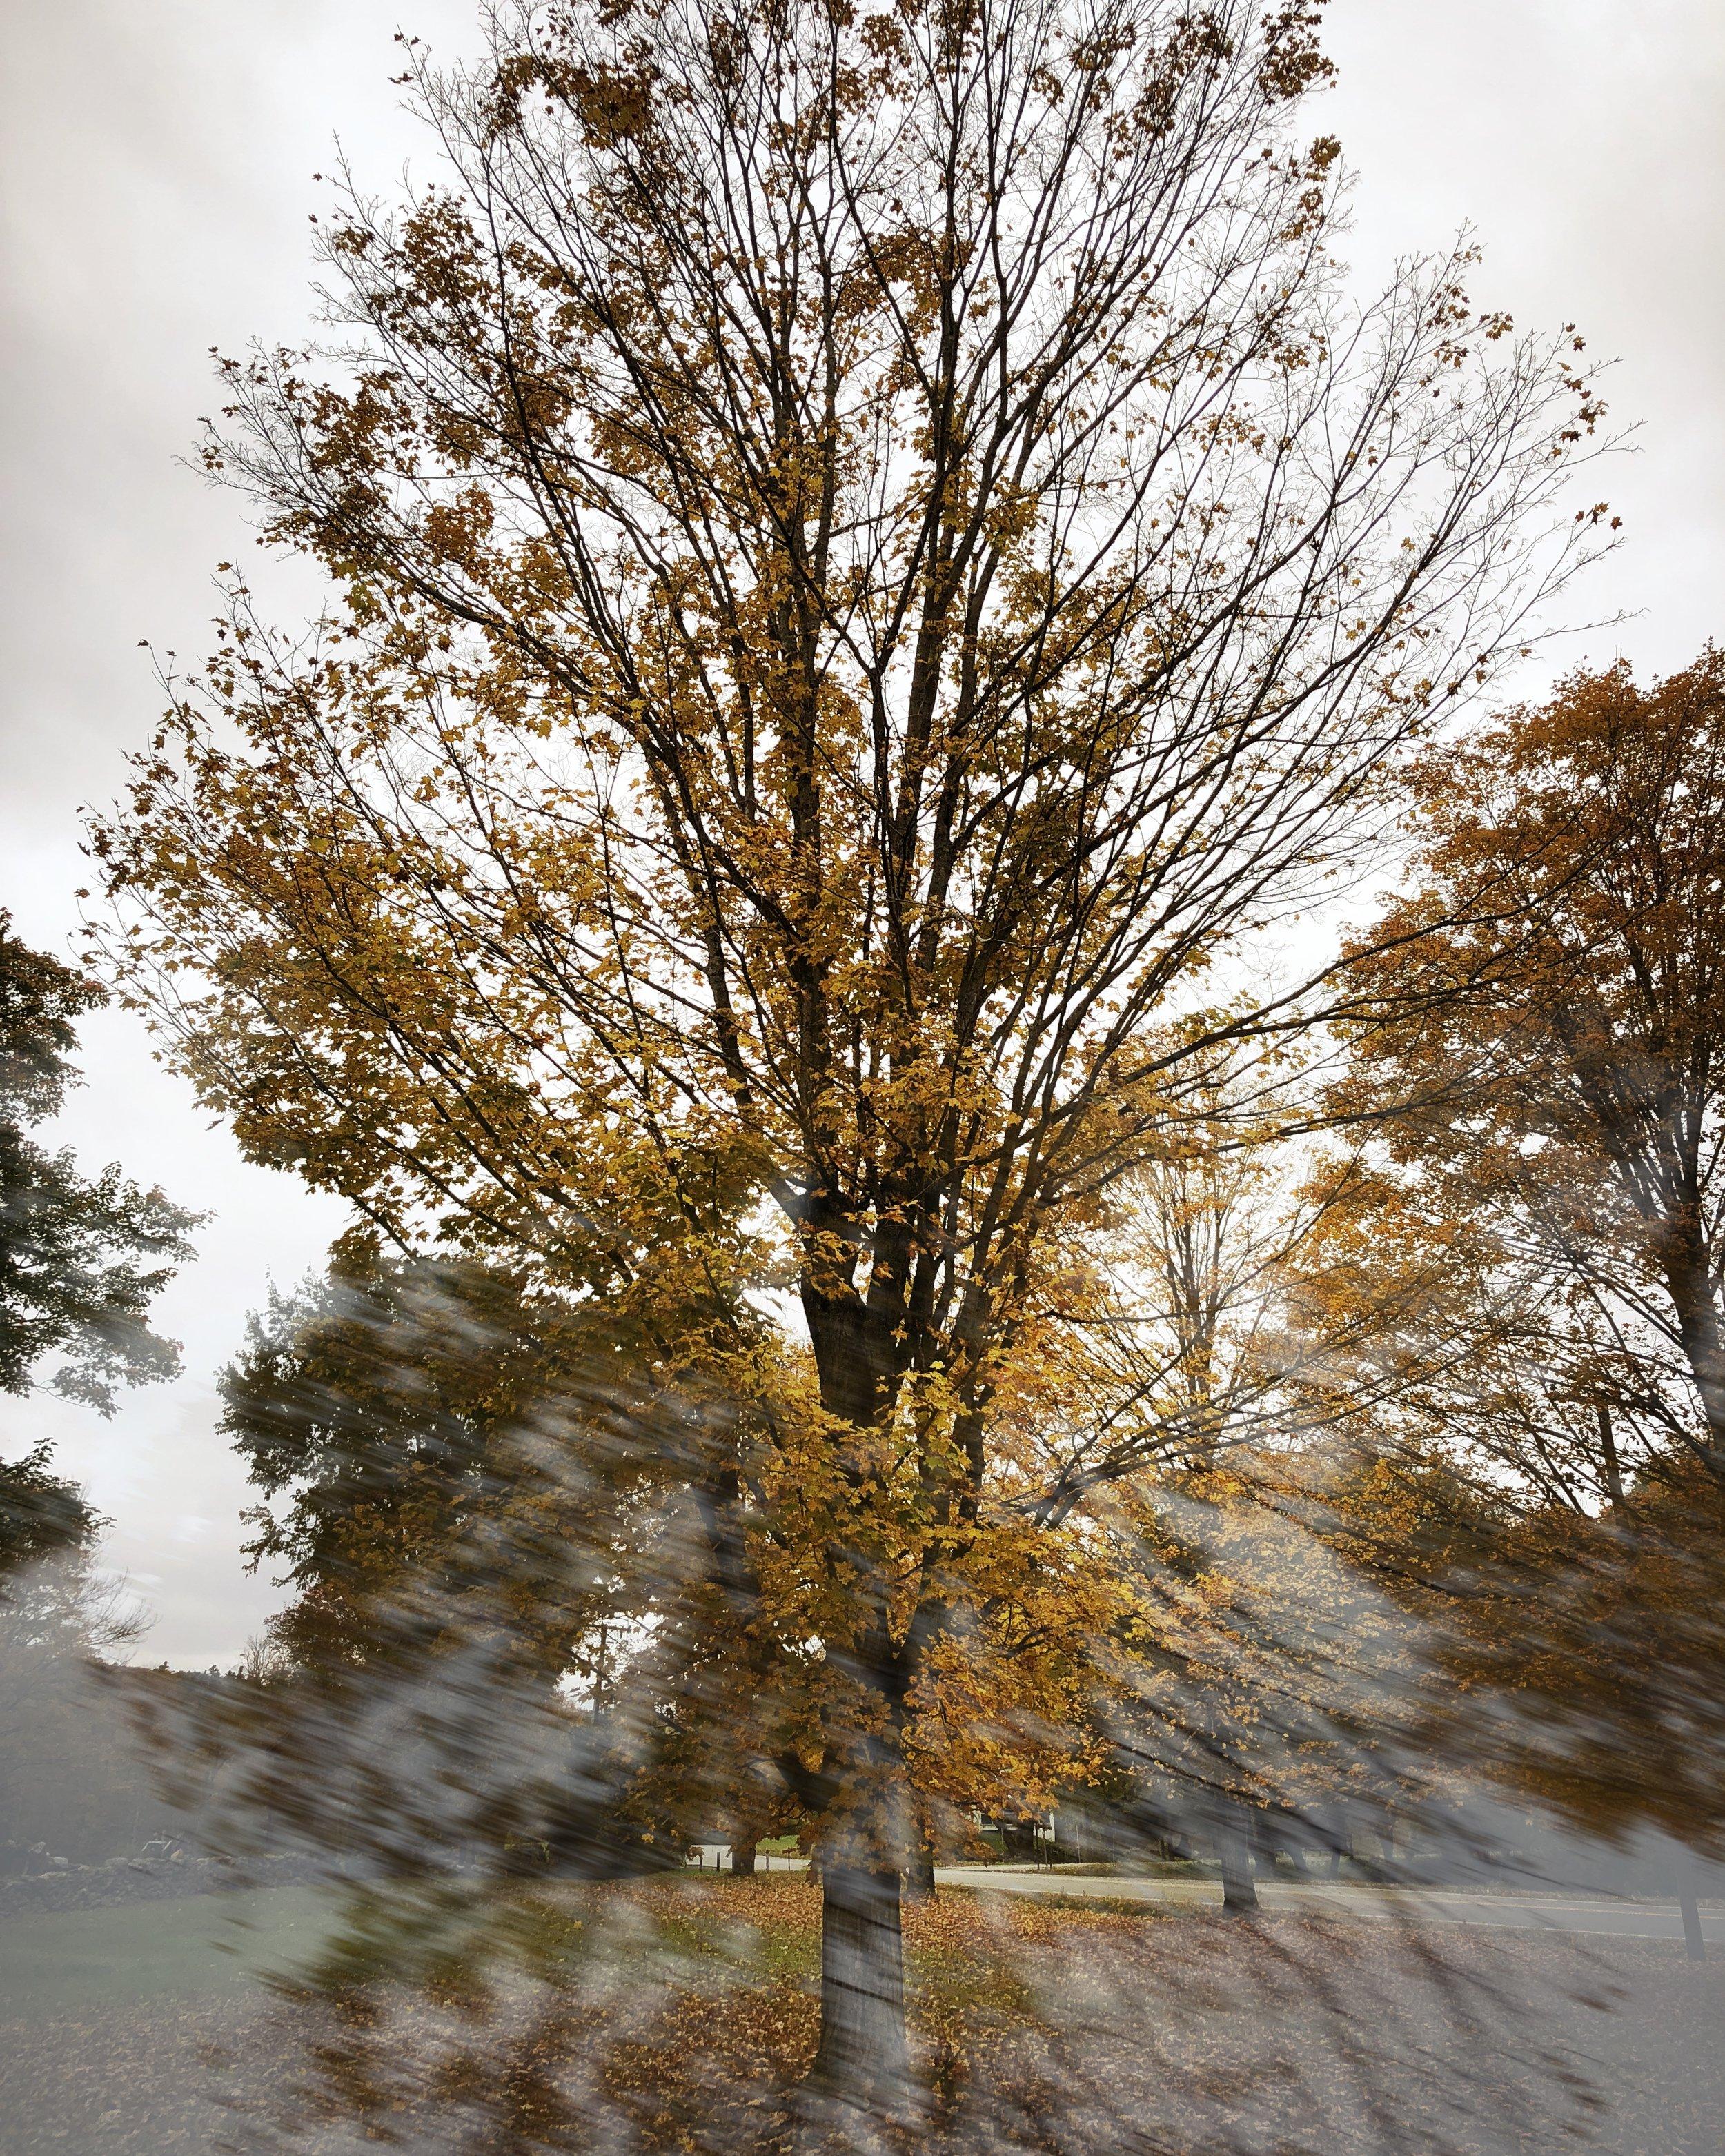 ©Tree in Motion by Dena T Bray.jpg